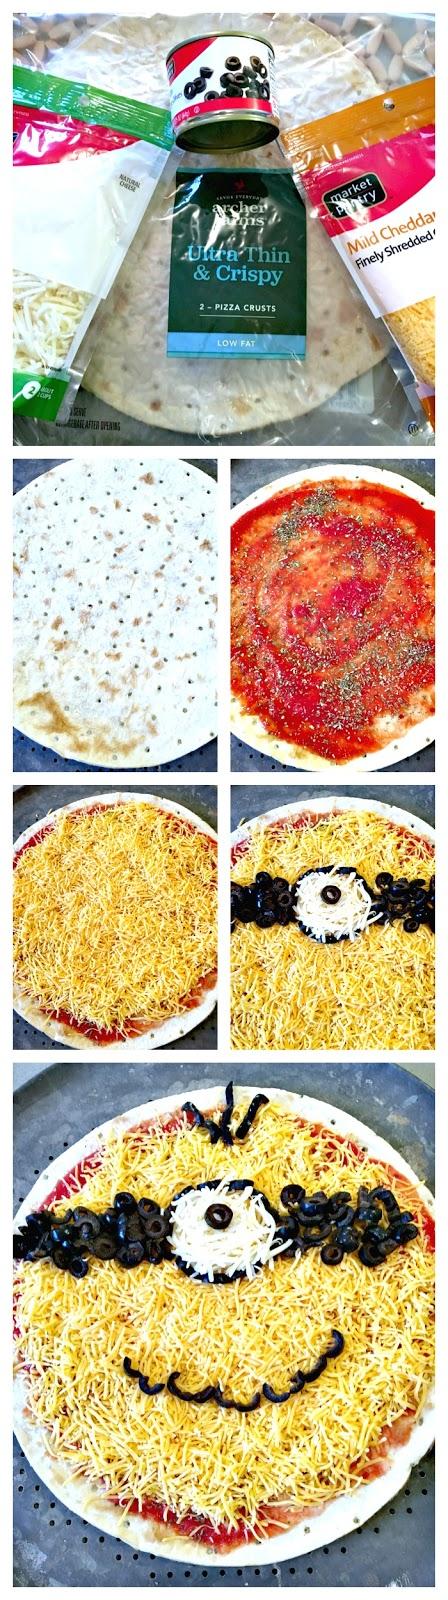 Minions Movie Release Party, Free Target Gift Card, Minion Pizza Recipe, Minion fruit tray recipe, Minion ornament tutorial